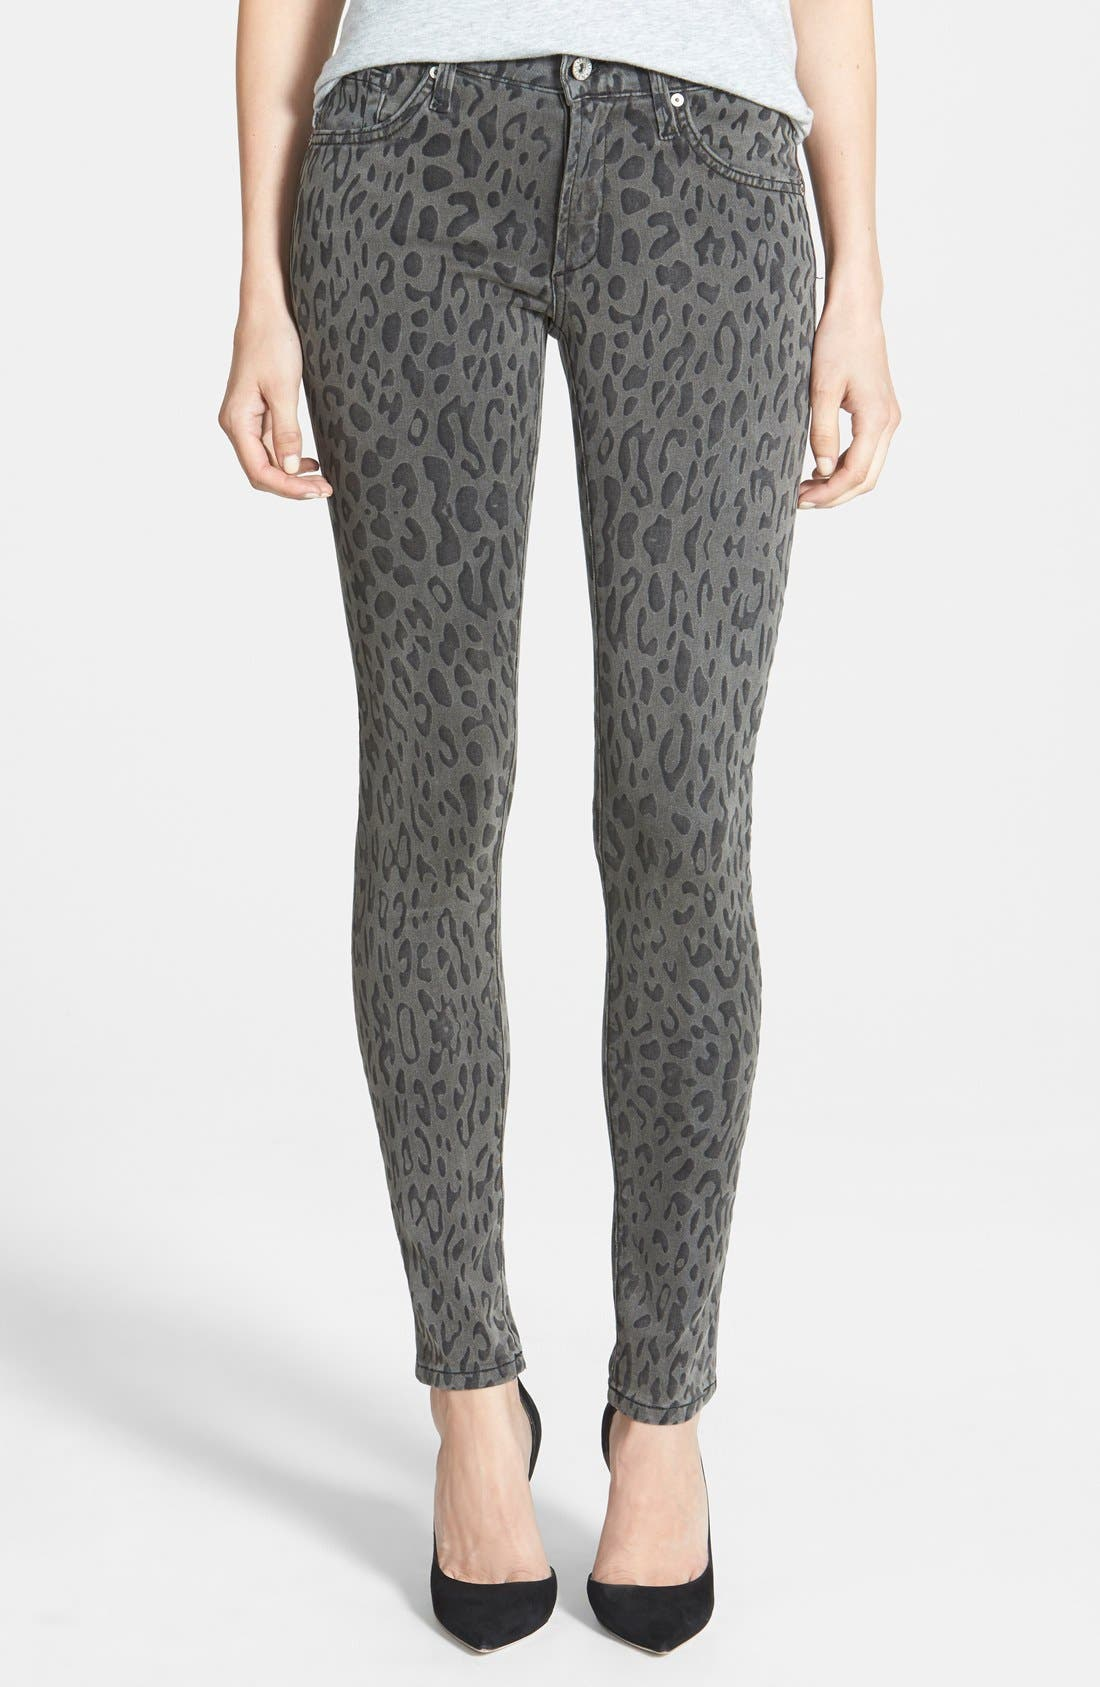 Main Image - James Jeans Five Pocket Leggings (Cougar)